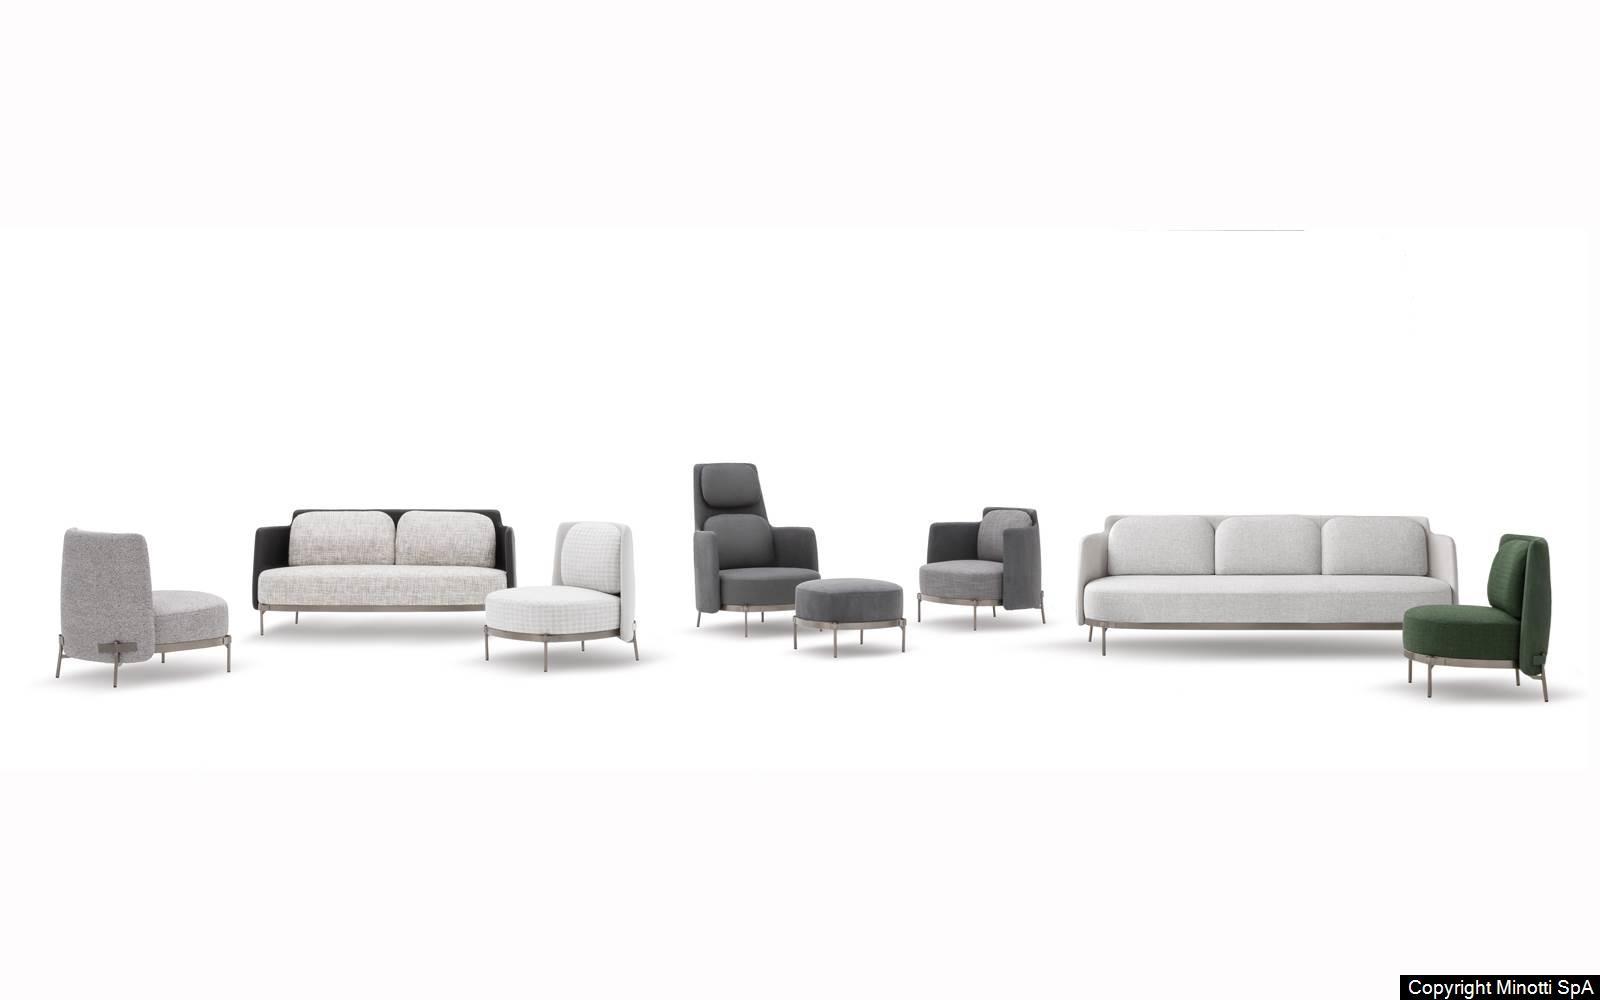 Nendo Design Studio